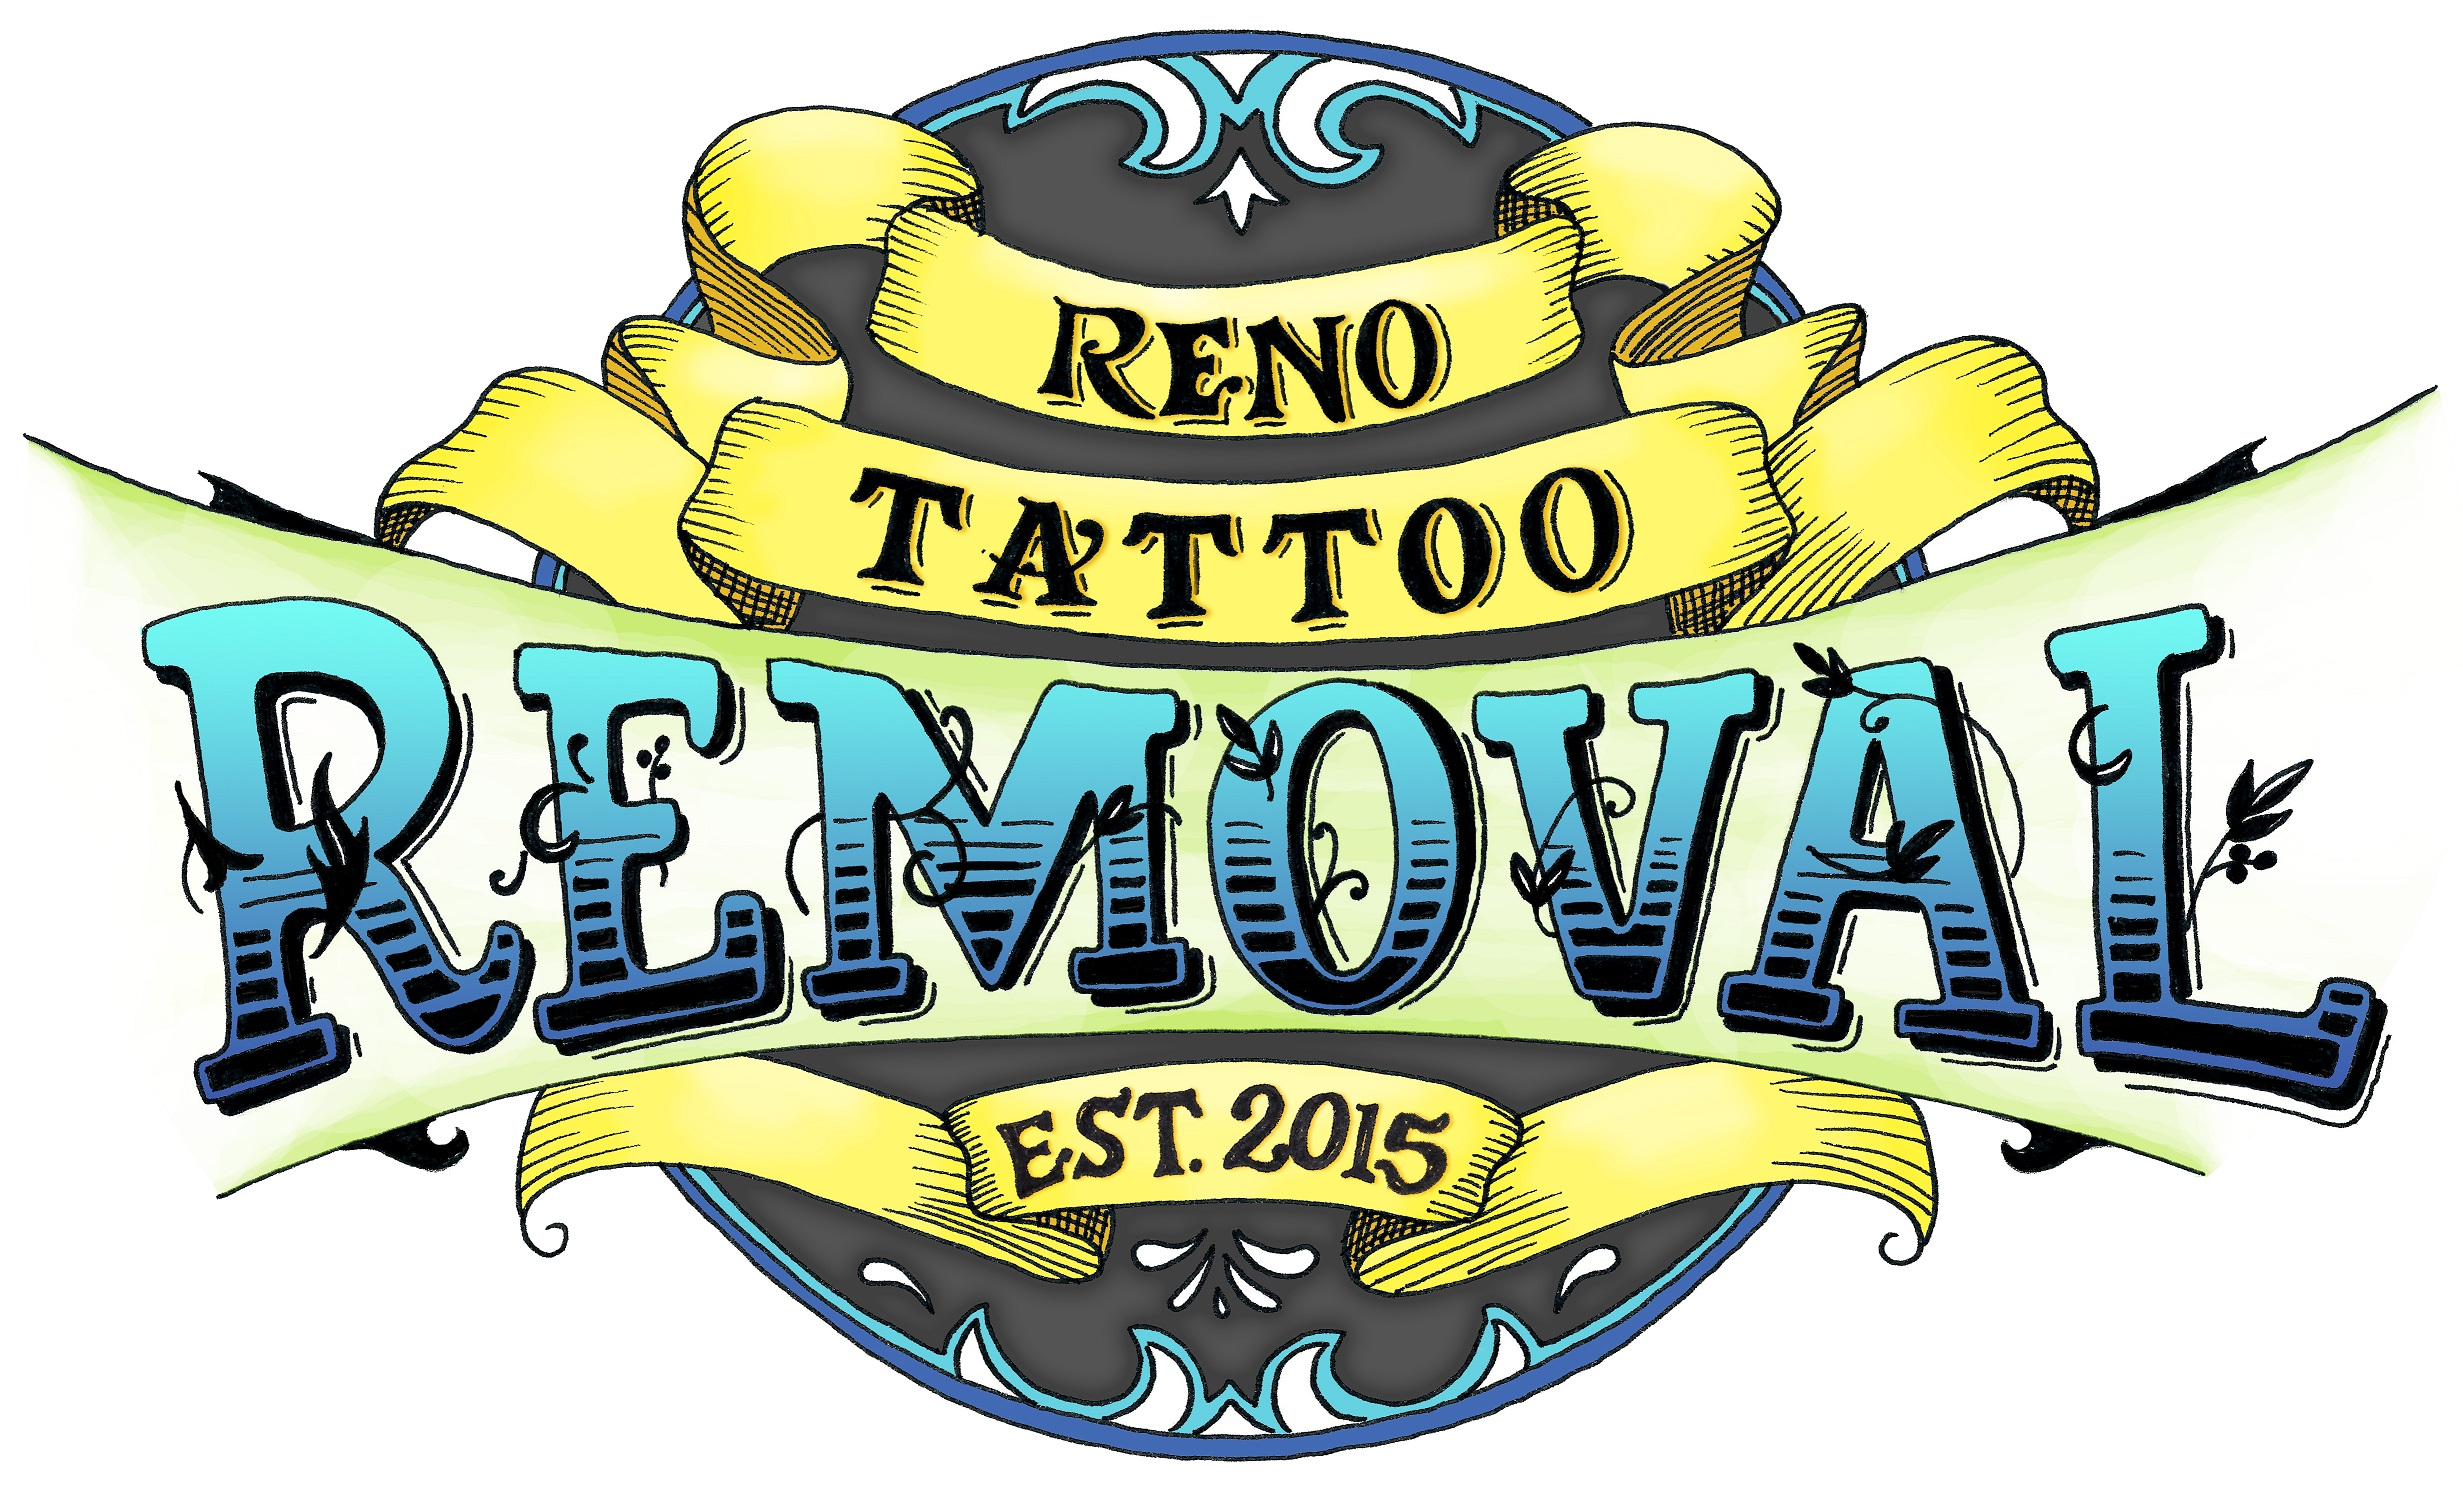 Reno Tattoo Removal logo